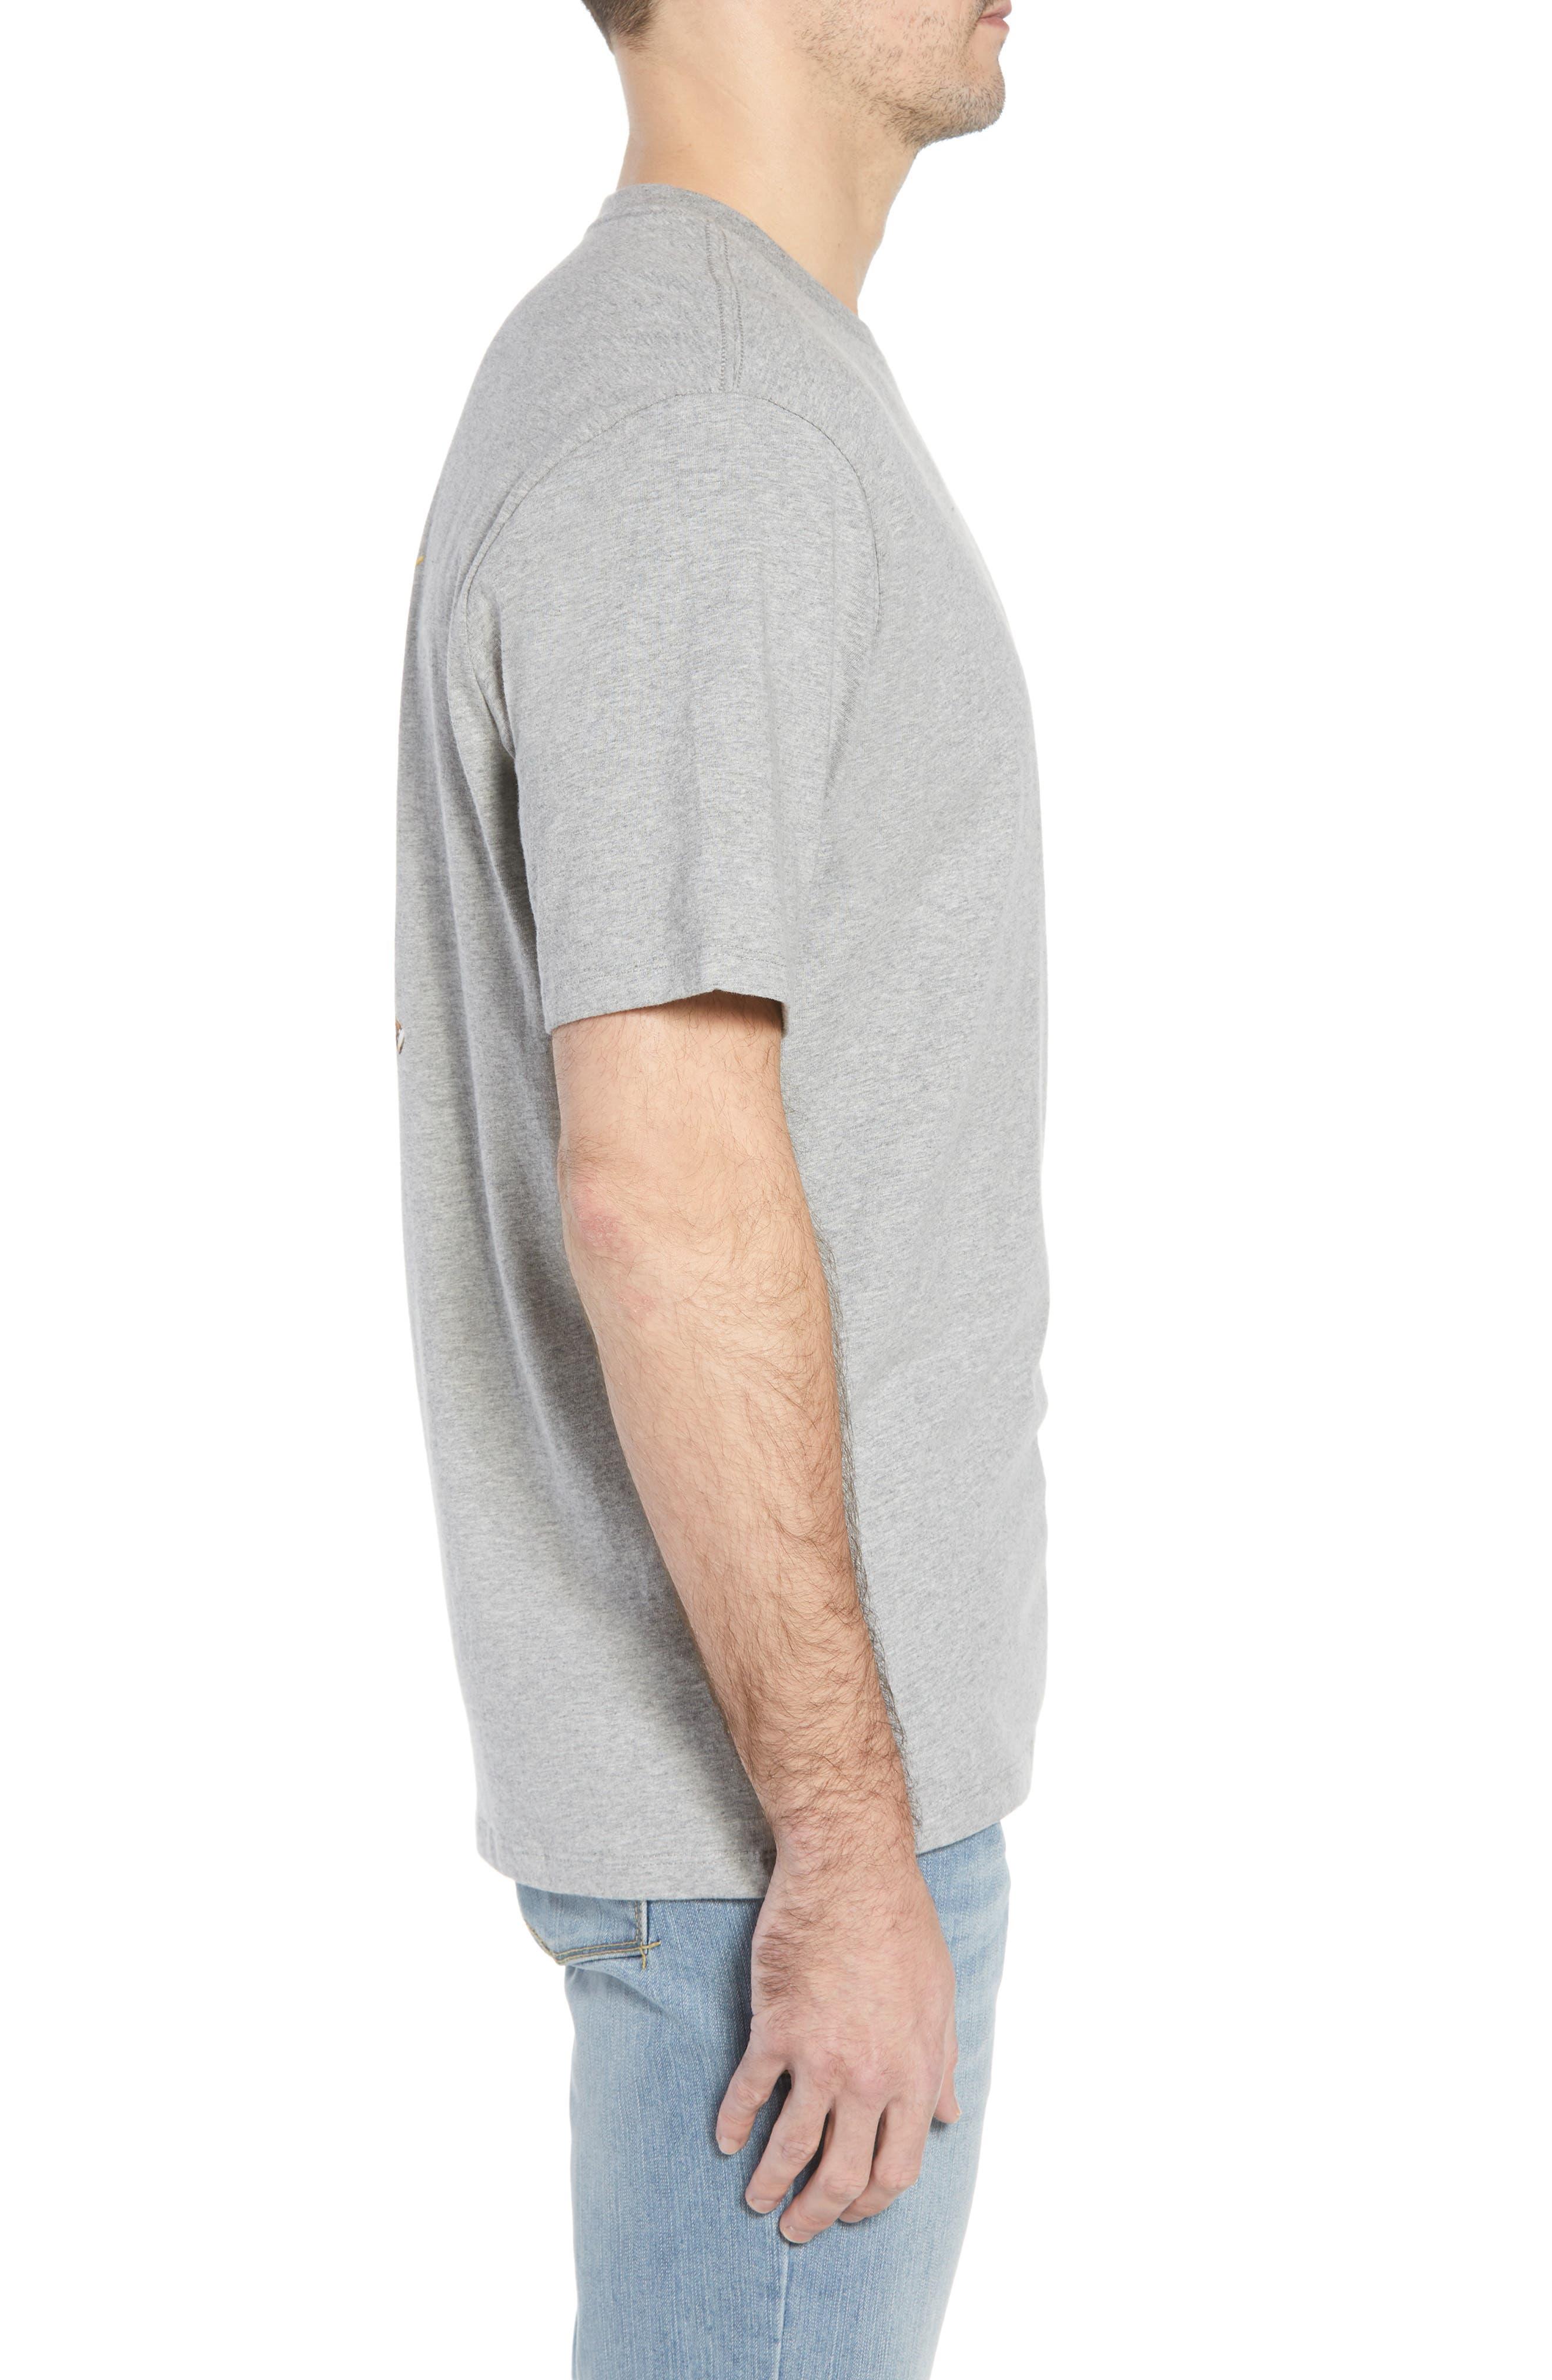 Chalk & Roll T-Shirt,                             Alternate thumbnail 3, color,                             Grey Heather